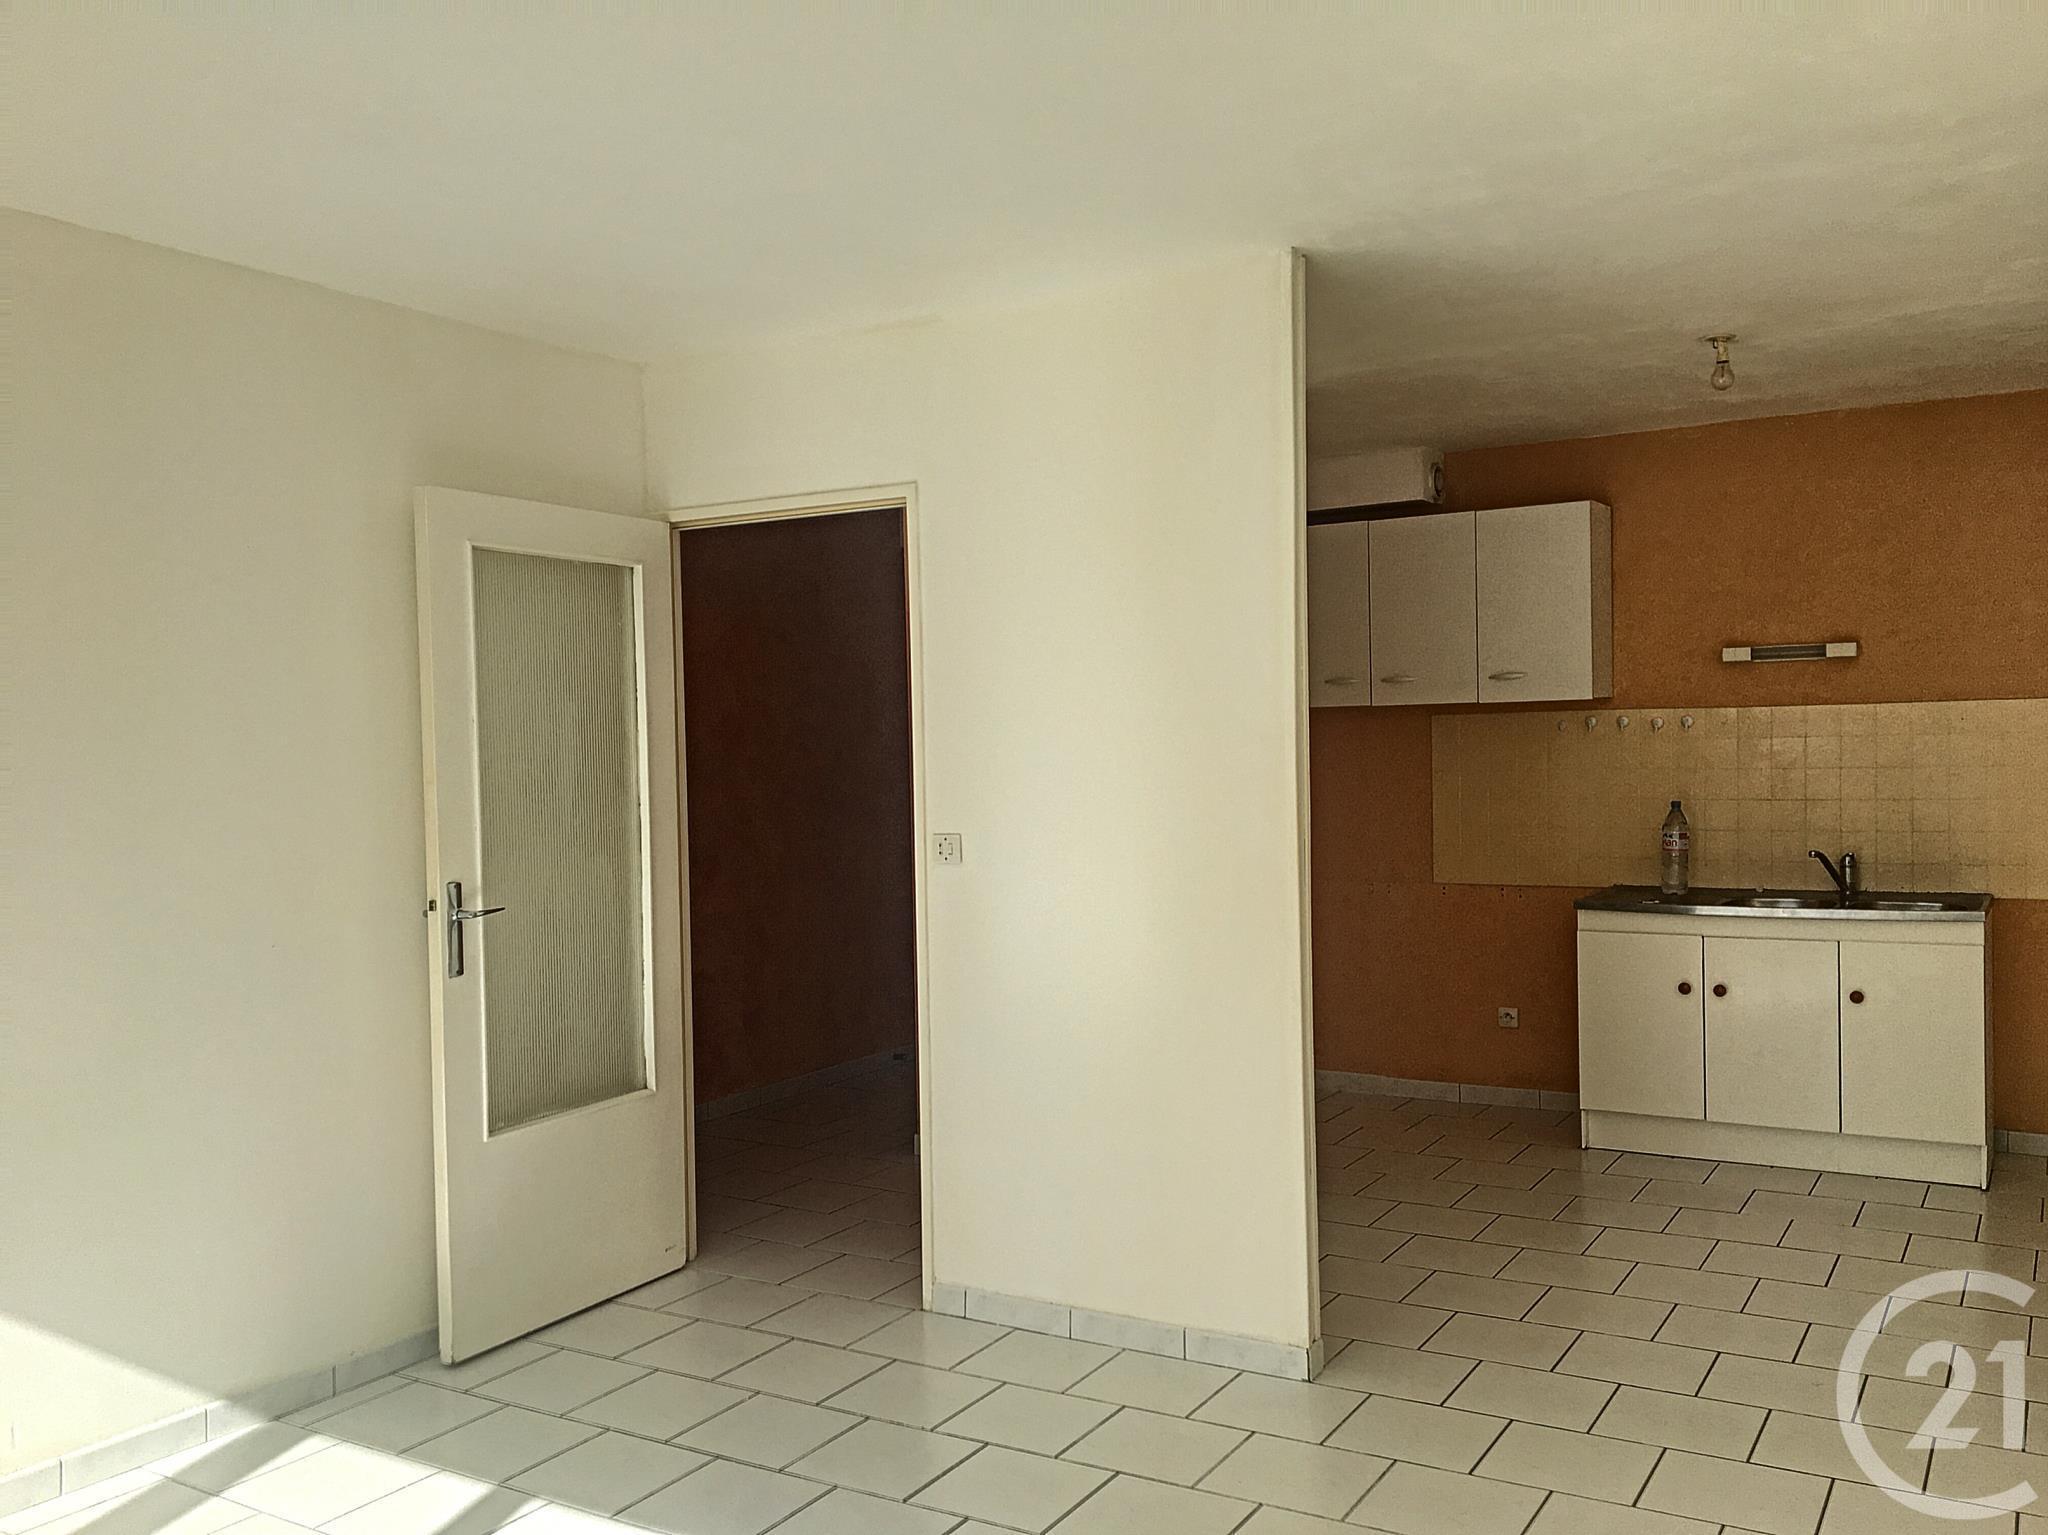 appartement 2 pi ces vendre troyes 10000 ref 52481 century 21. Black Bedroom Furniture Sets. Home Design Ideas